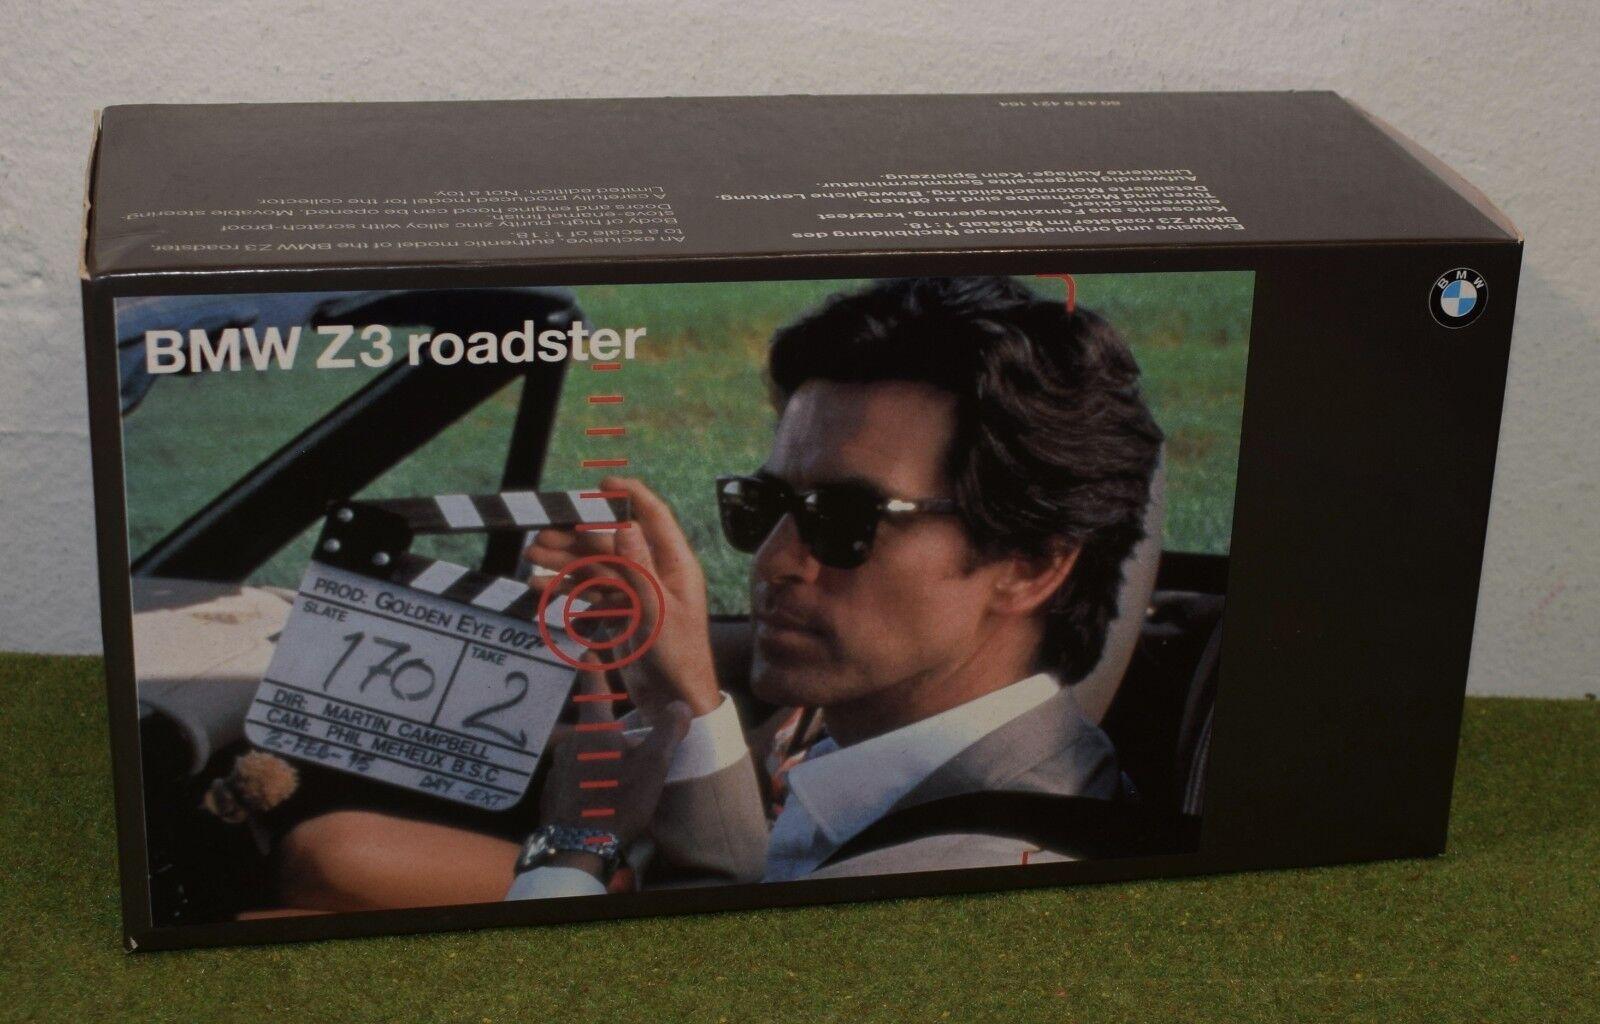 JAMES BOND 007 1 18 SCALE GoldENEYE  BMW Z3 ROADSTER